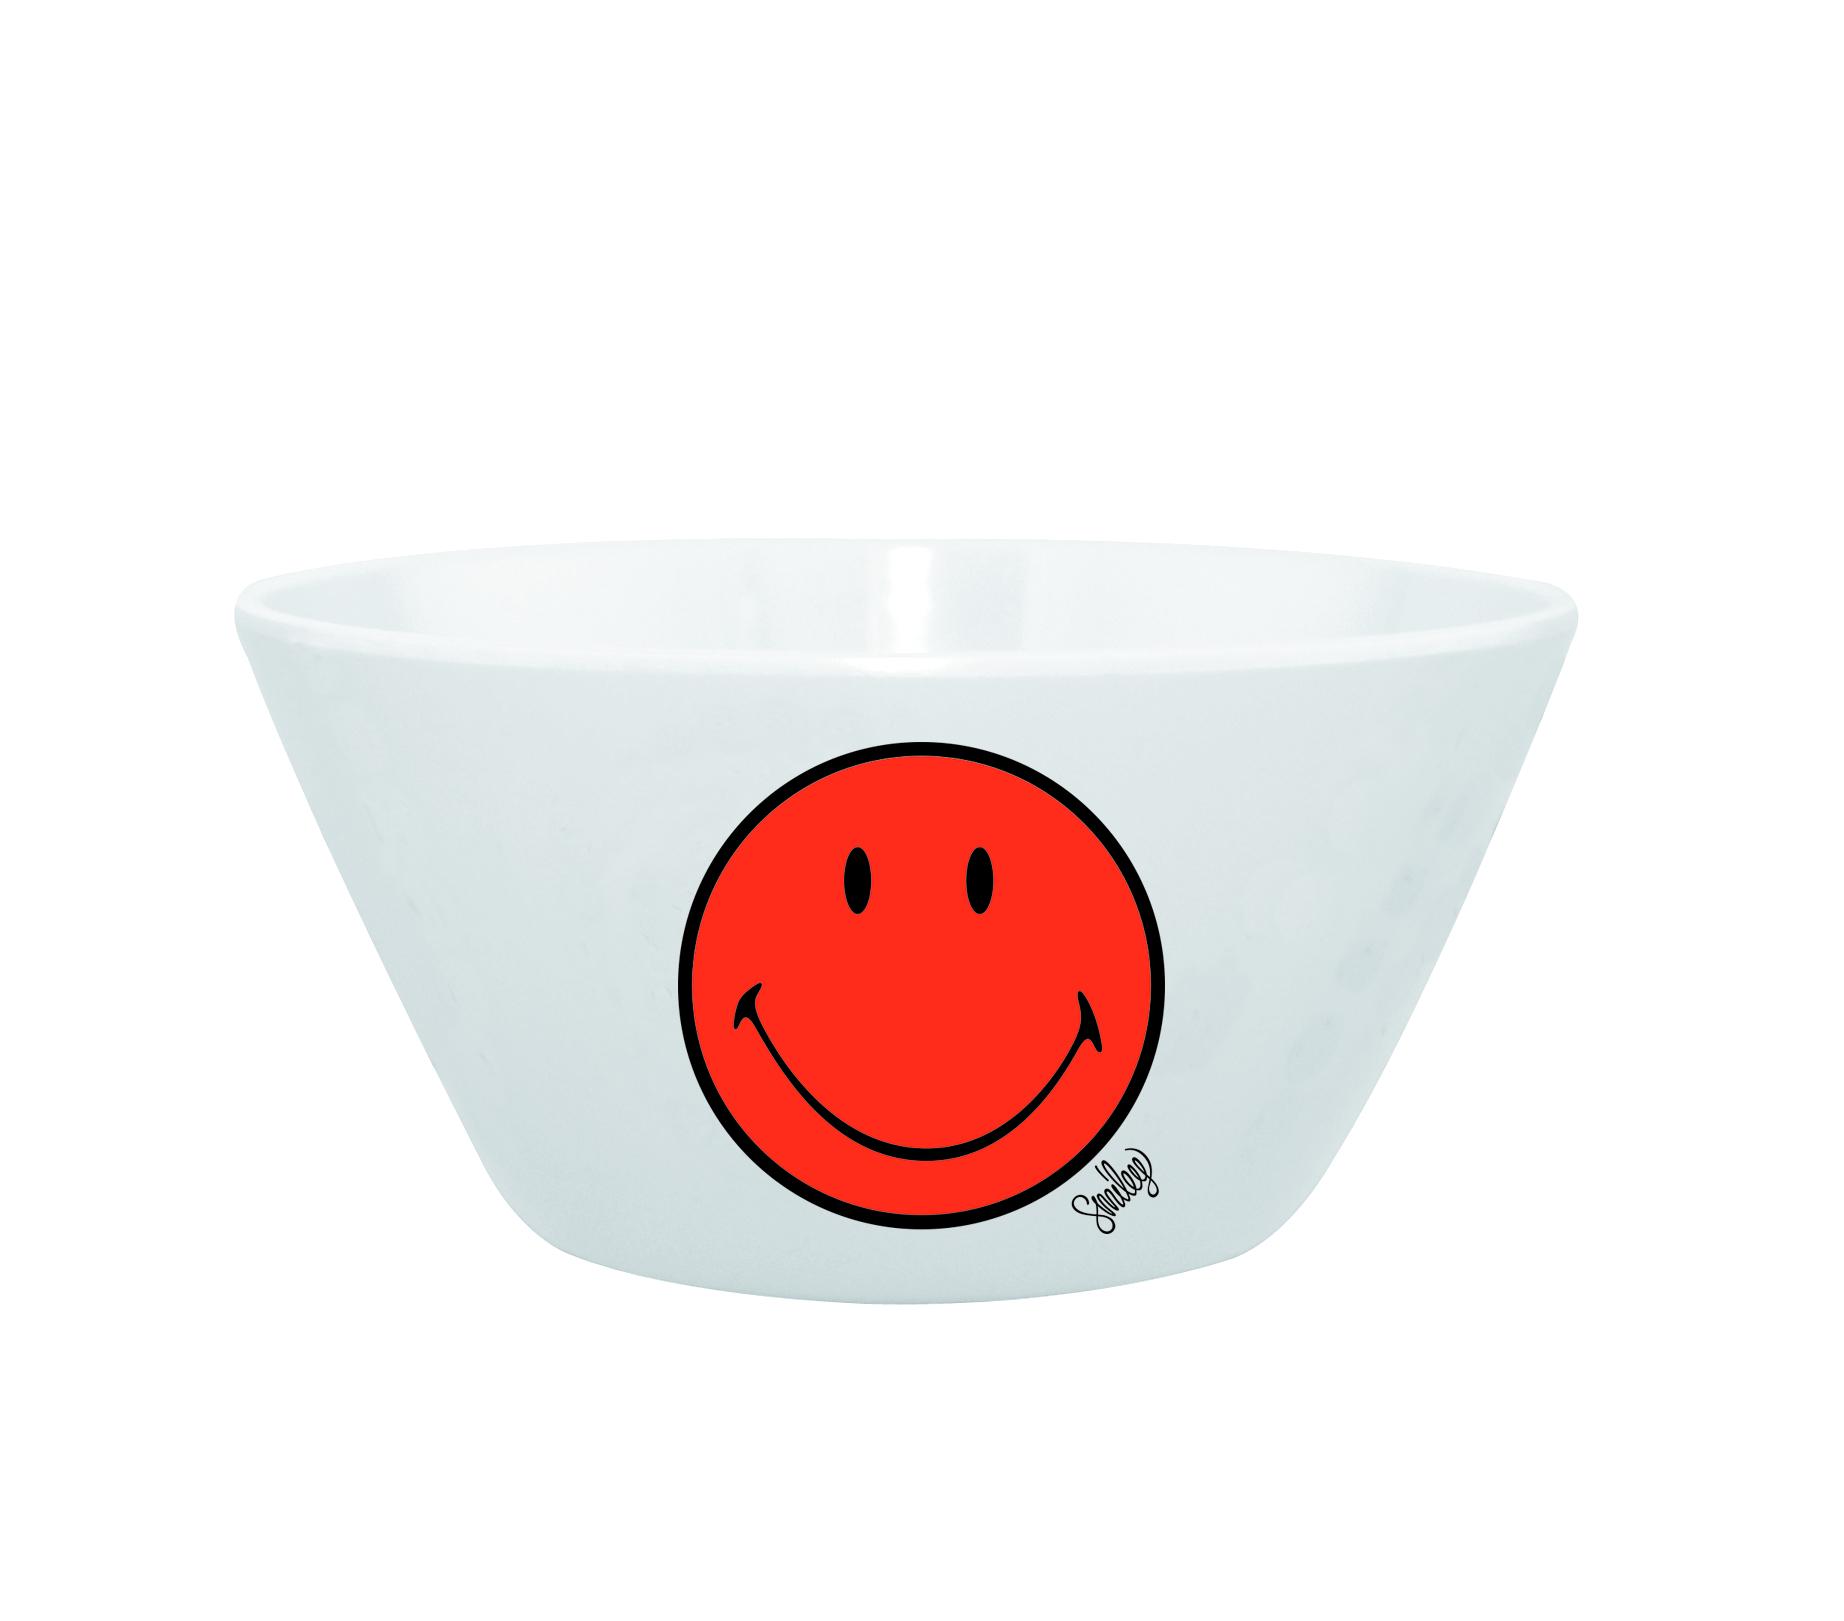 Mini Bol pentru cereale Smiley Portocaliu/Alb O15 cm